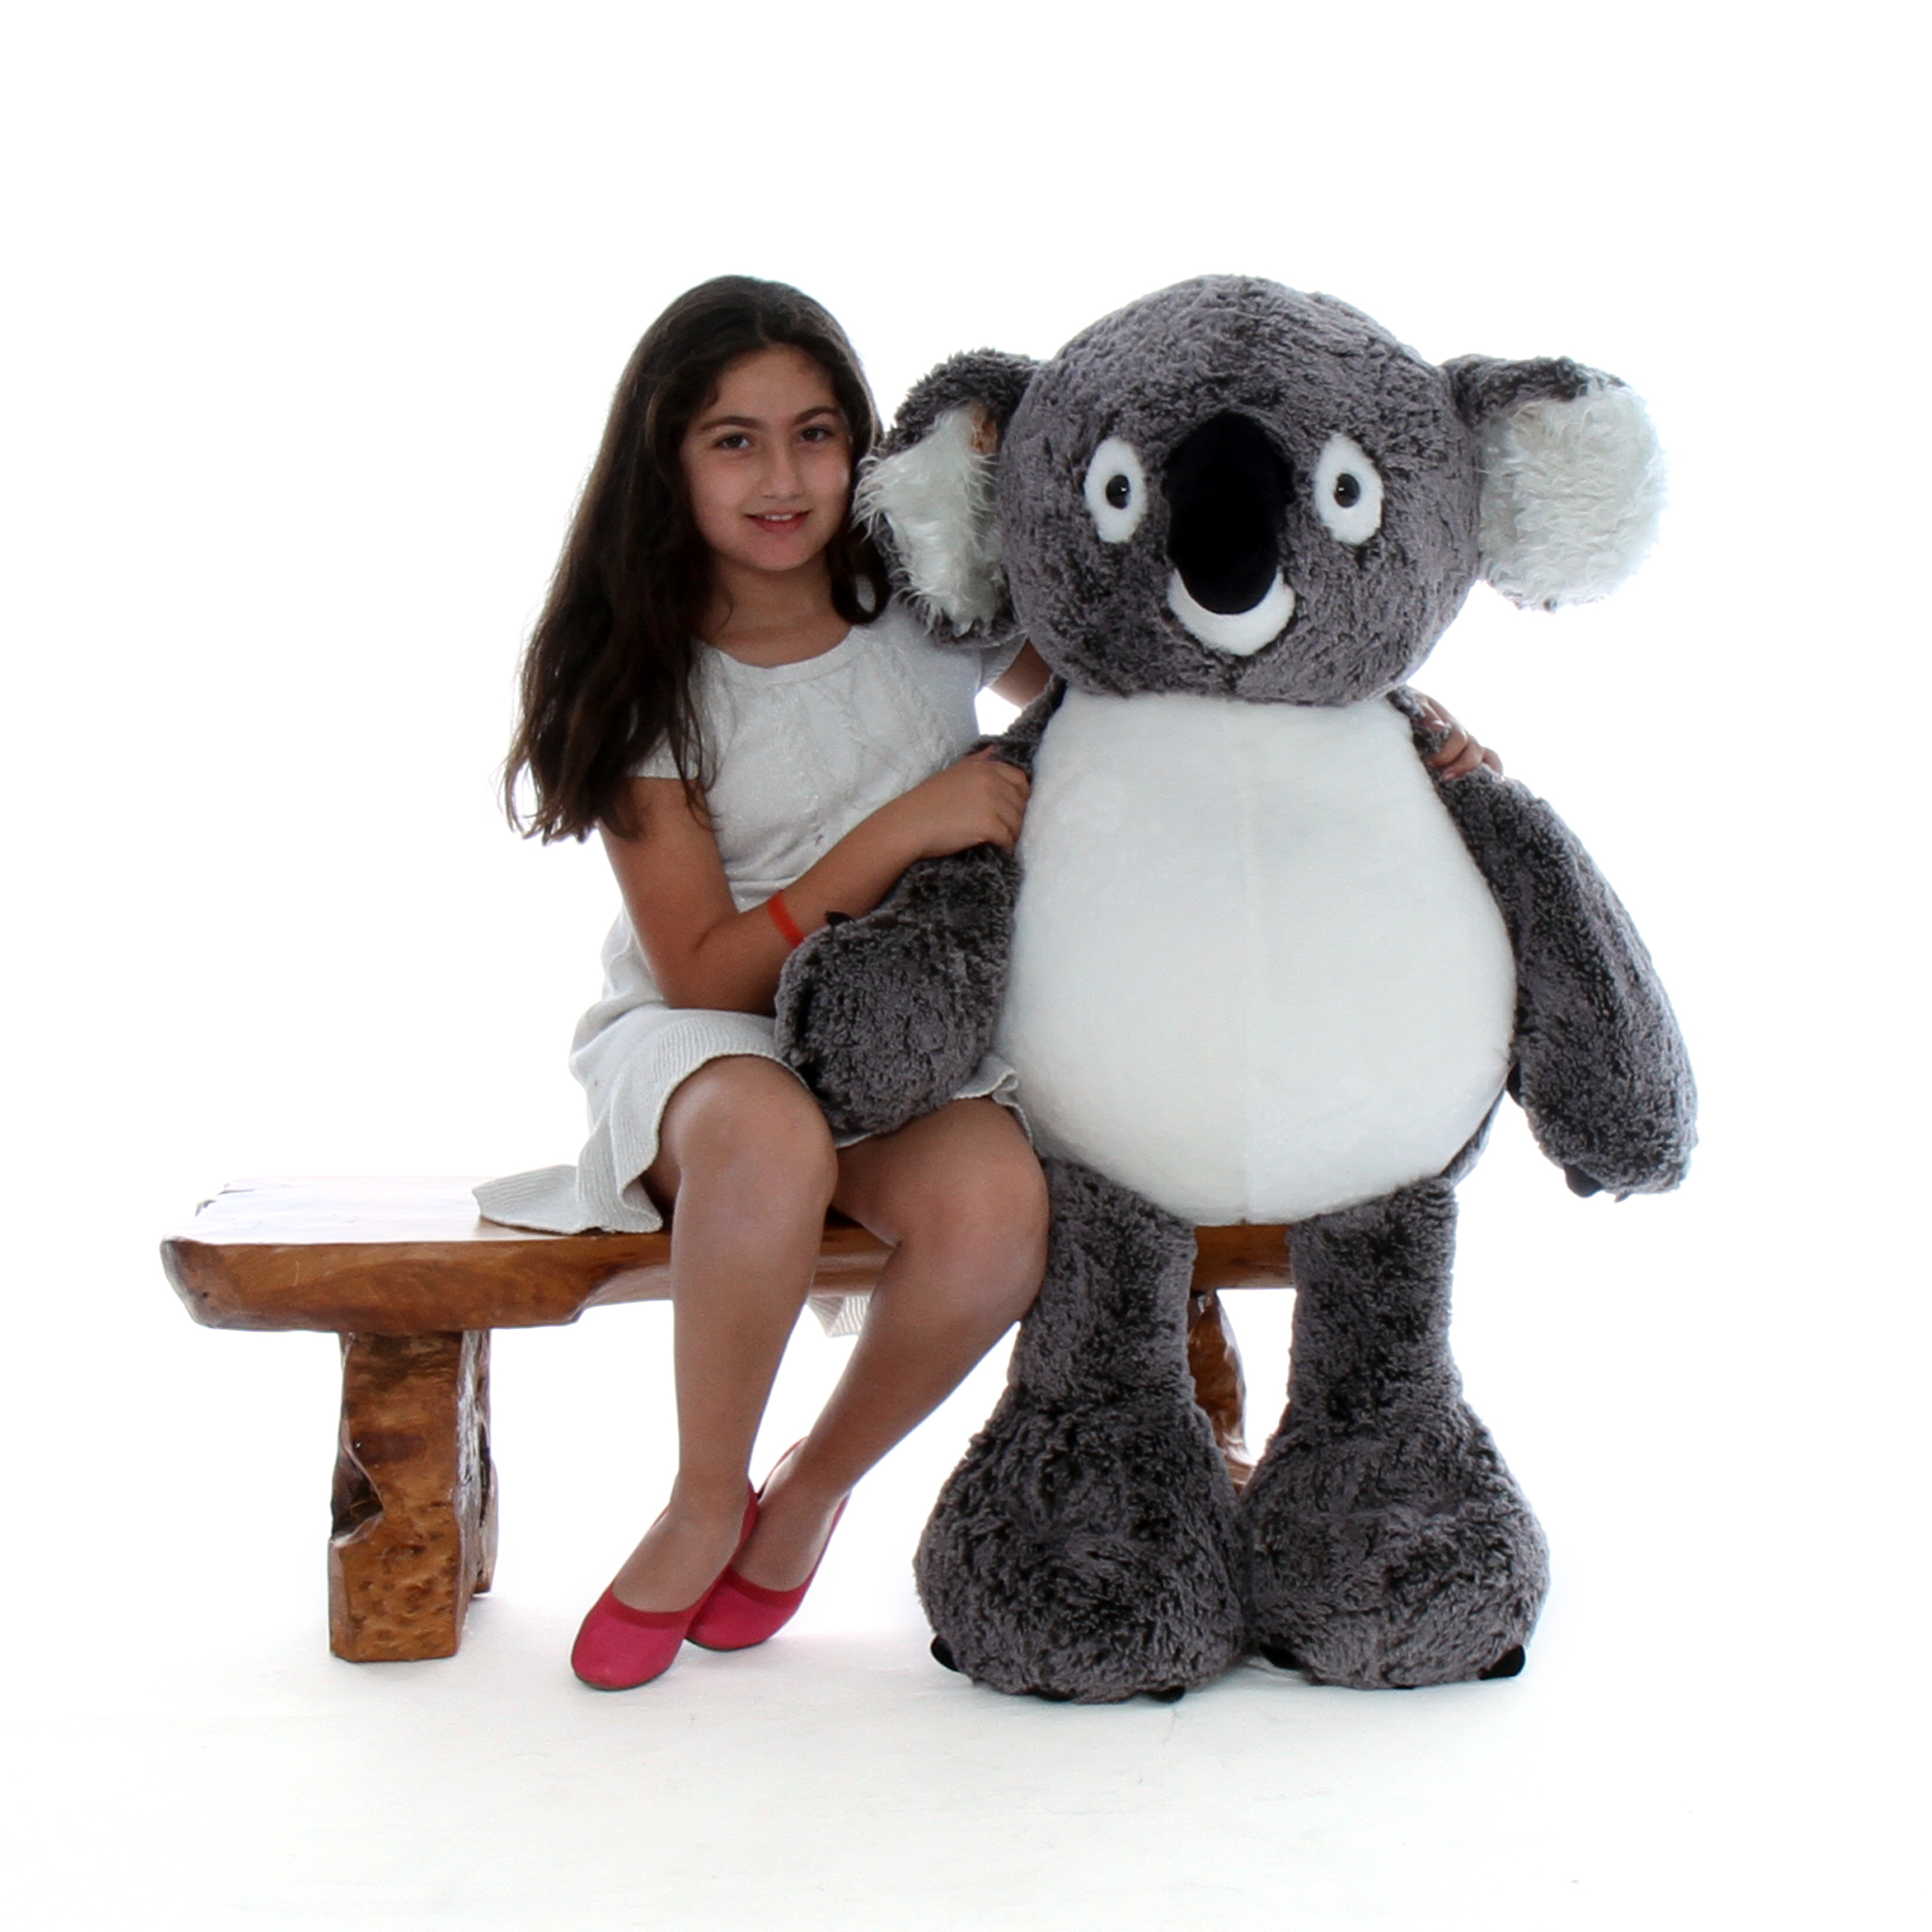 4ft-adorable-huge-gray-koala-bear.jpg